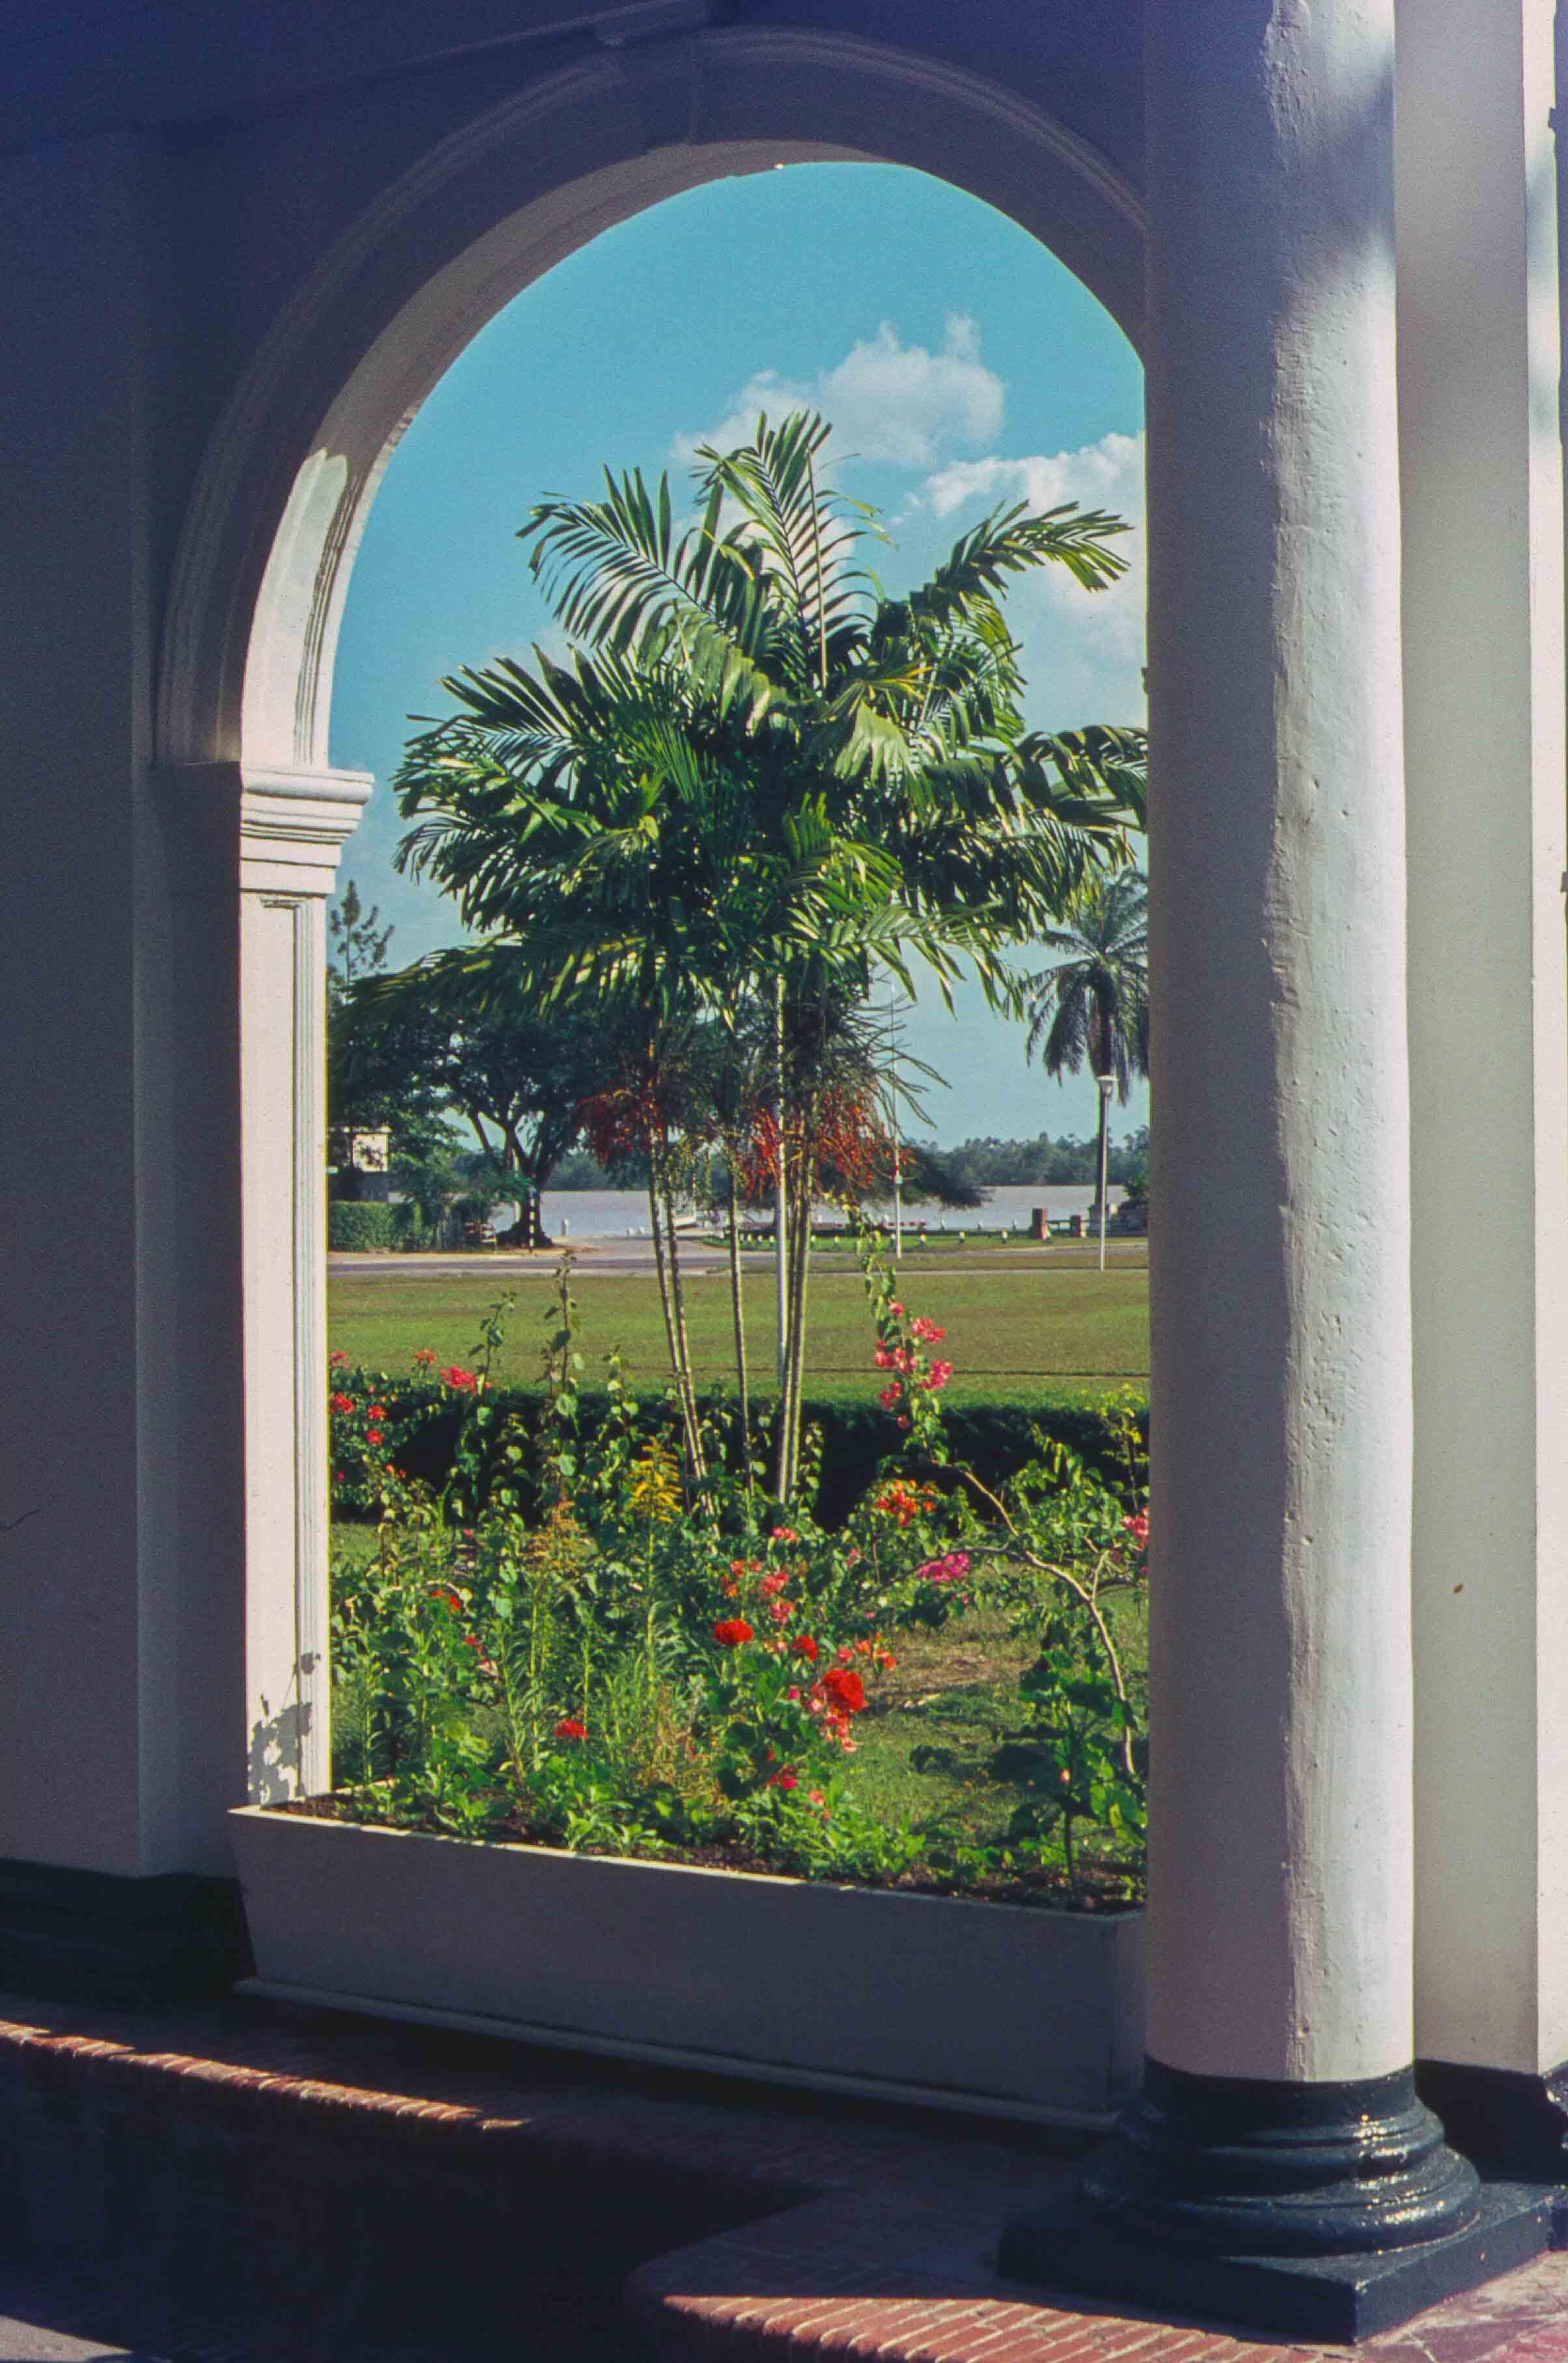 234. Suriname